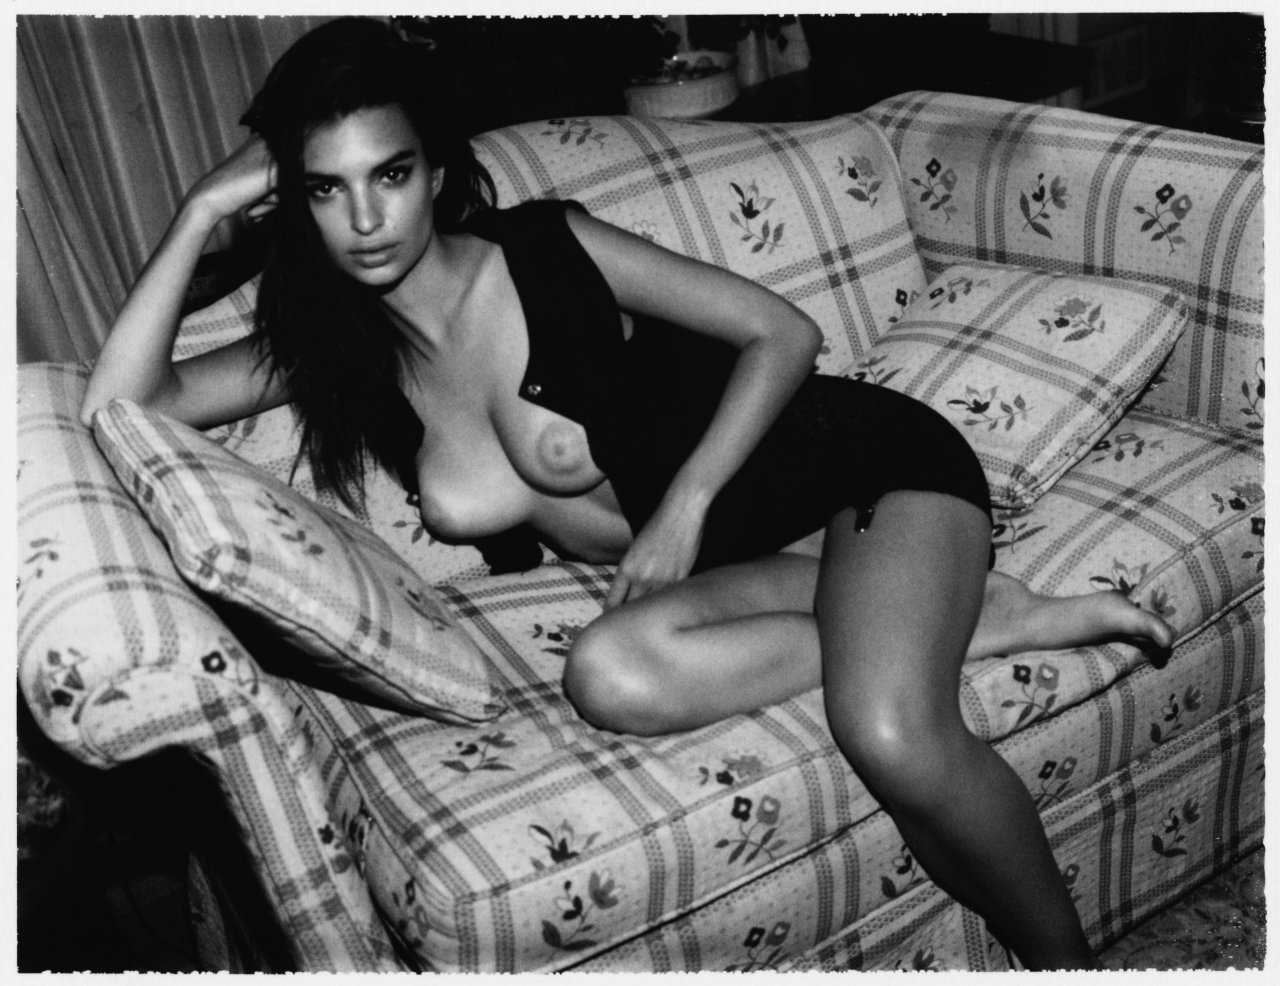 Emily Ratajkowski leaked nude